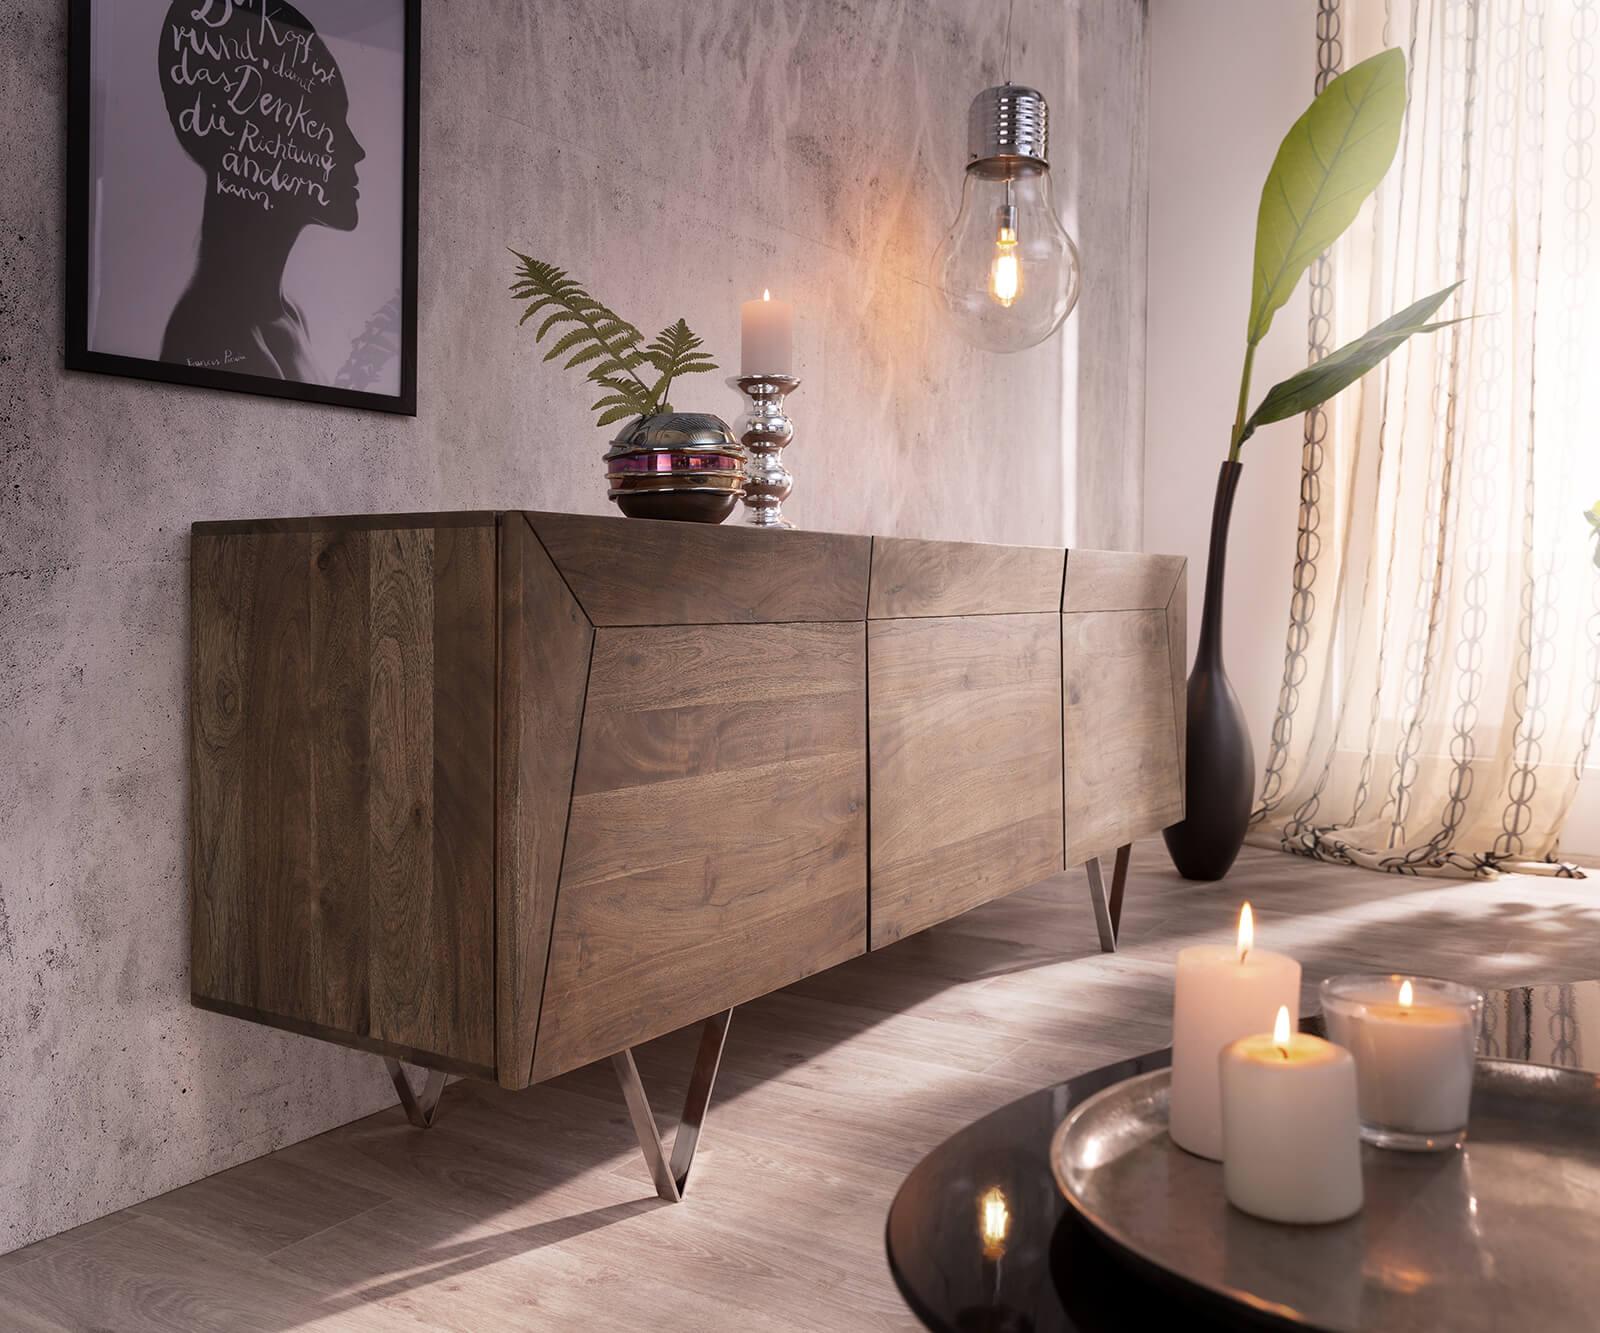 delife-design-sideboard-wyatt-175-cm-akazie-braun-3d-optik-oben-edelstahl-sideboards